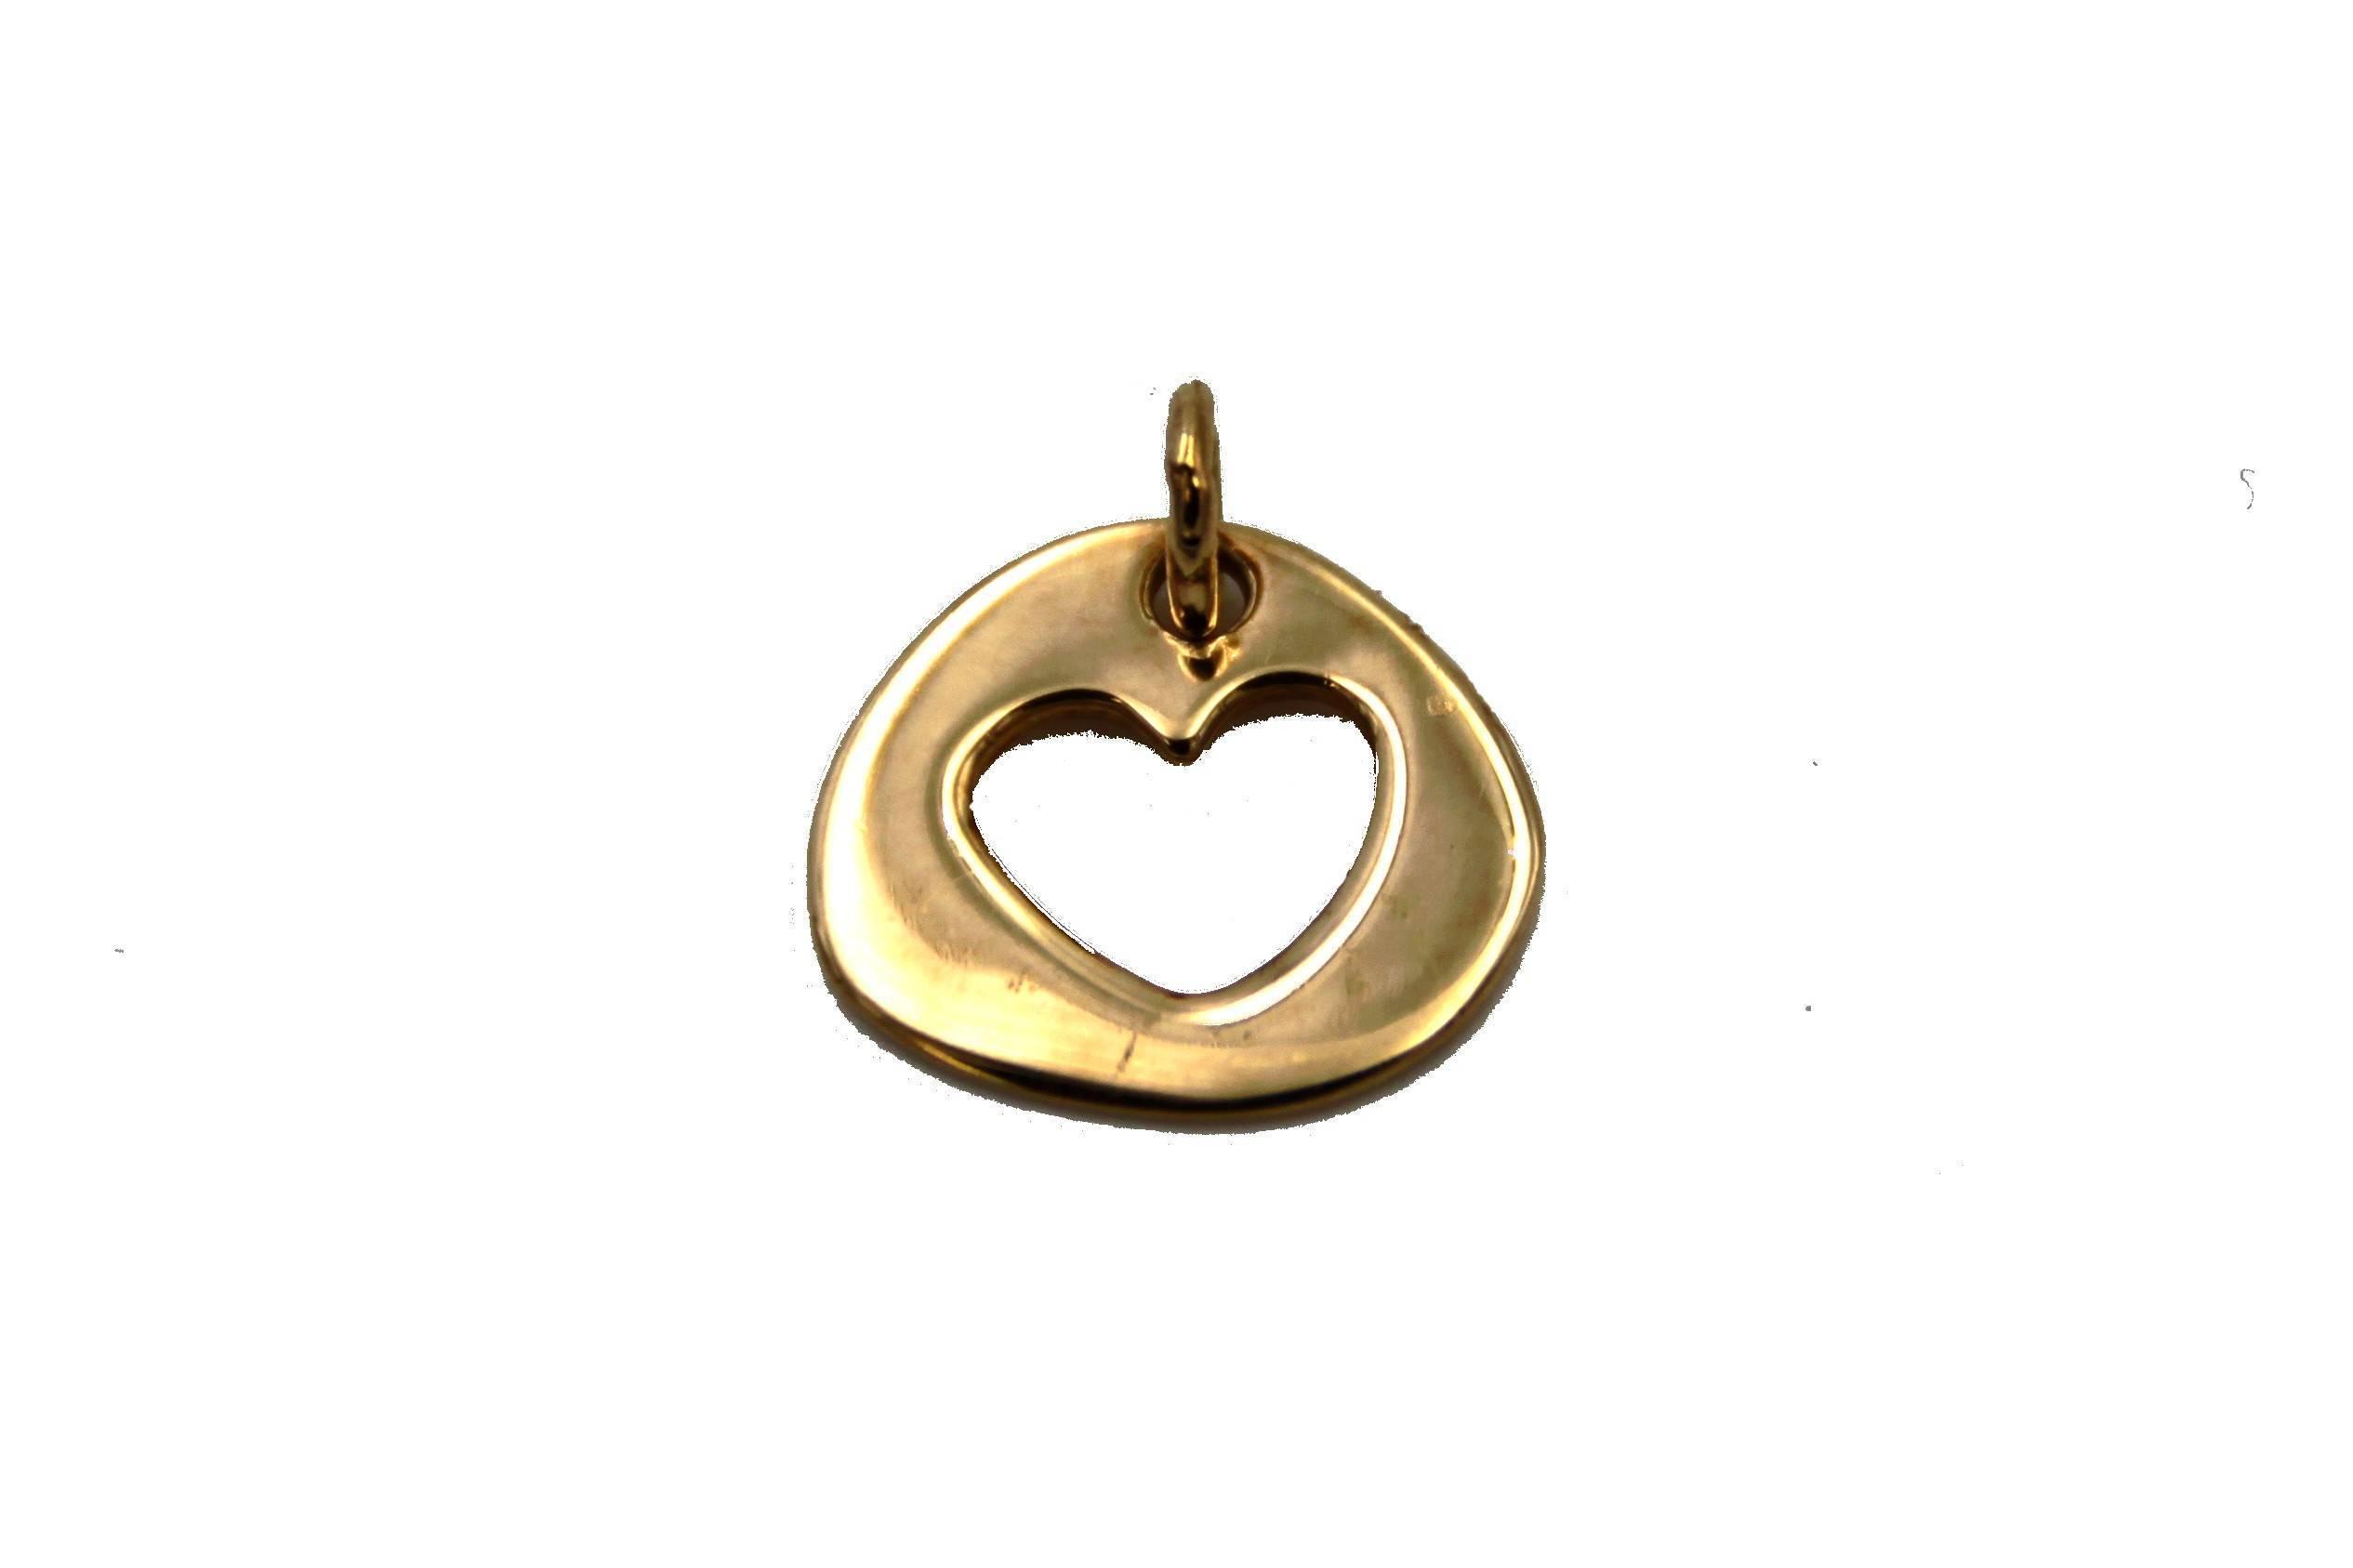 ac569522fbd8 Colgante de oro corazón san valentín amor Joyería Juan Luis Larráyoz  Pamplona comprar colgante corazón online